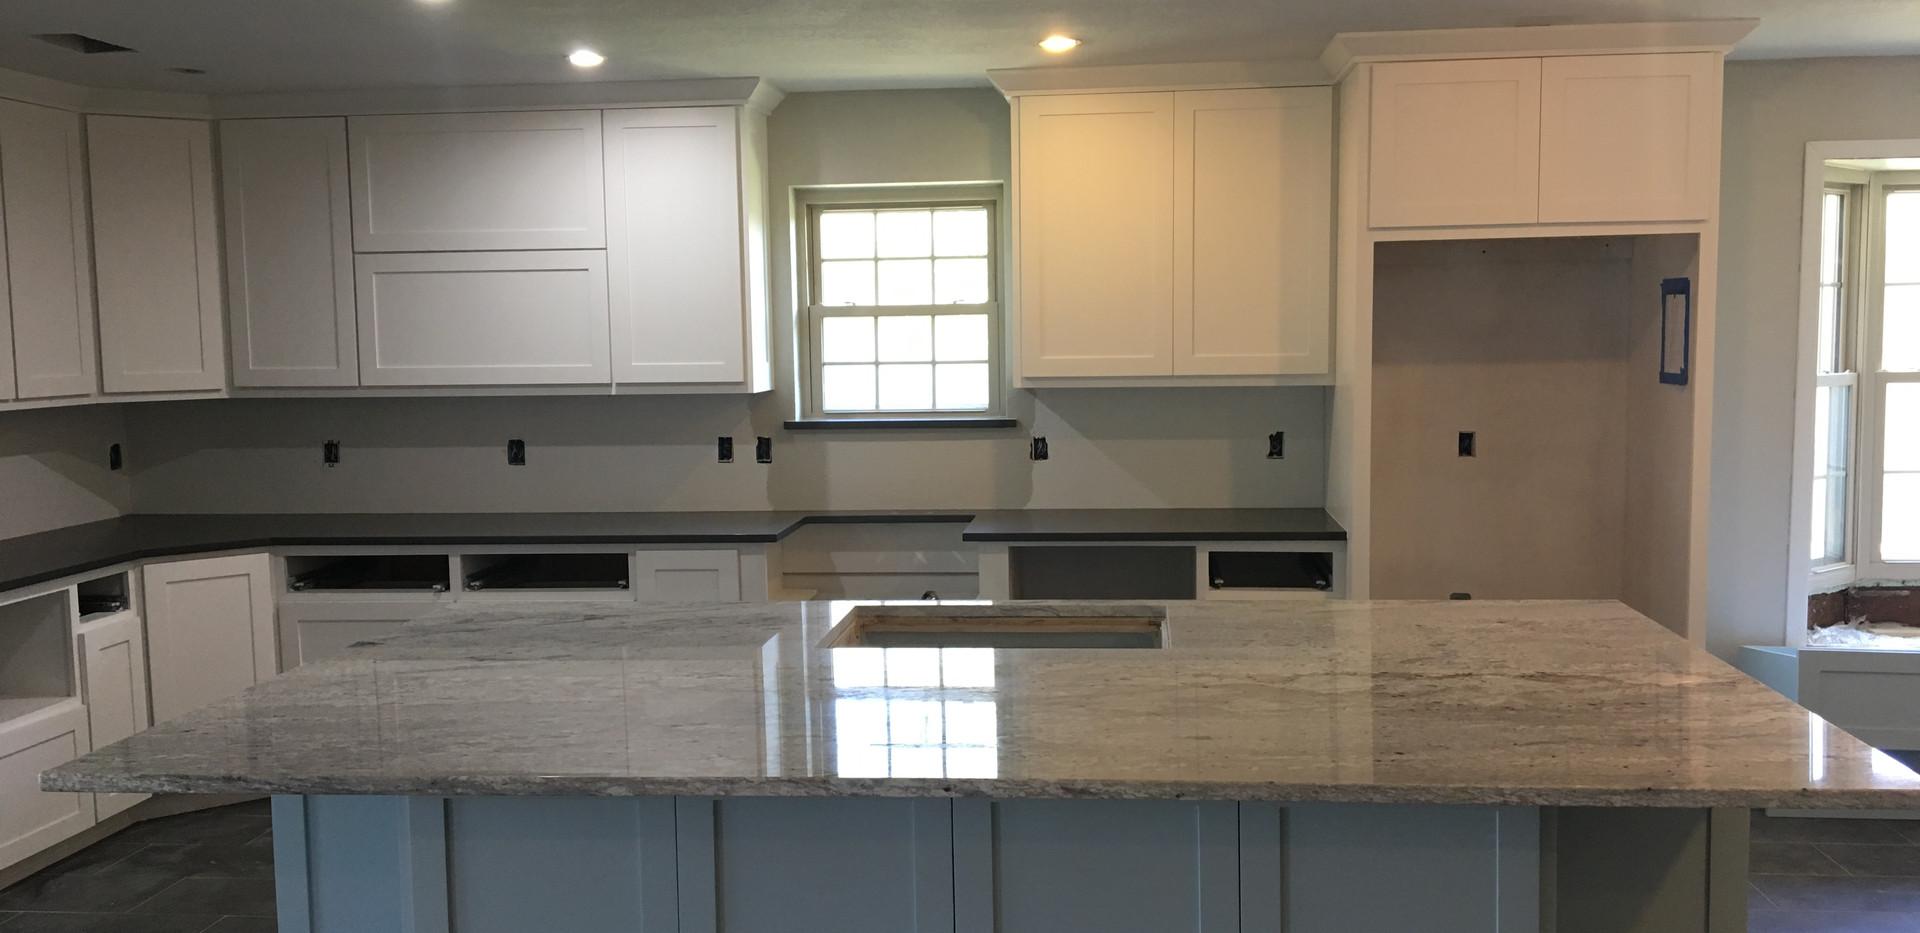 gray_granite_kitchen_countertop_island.J